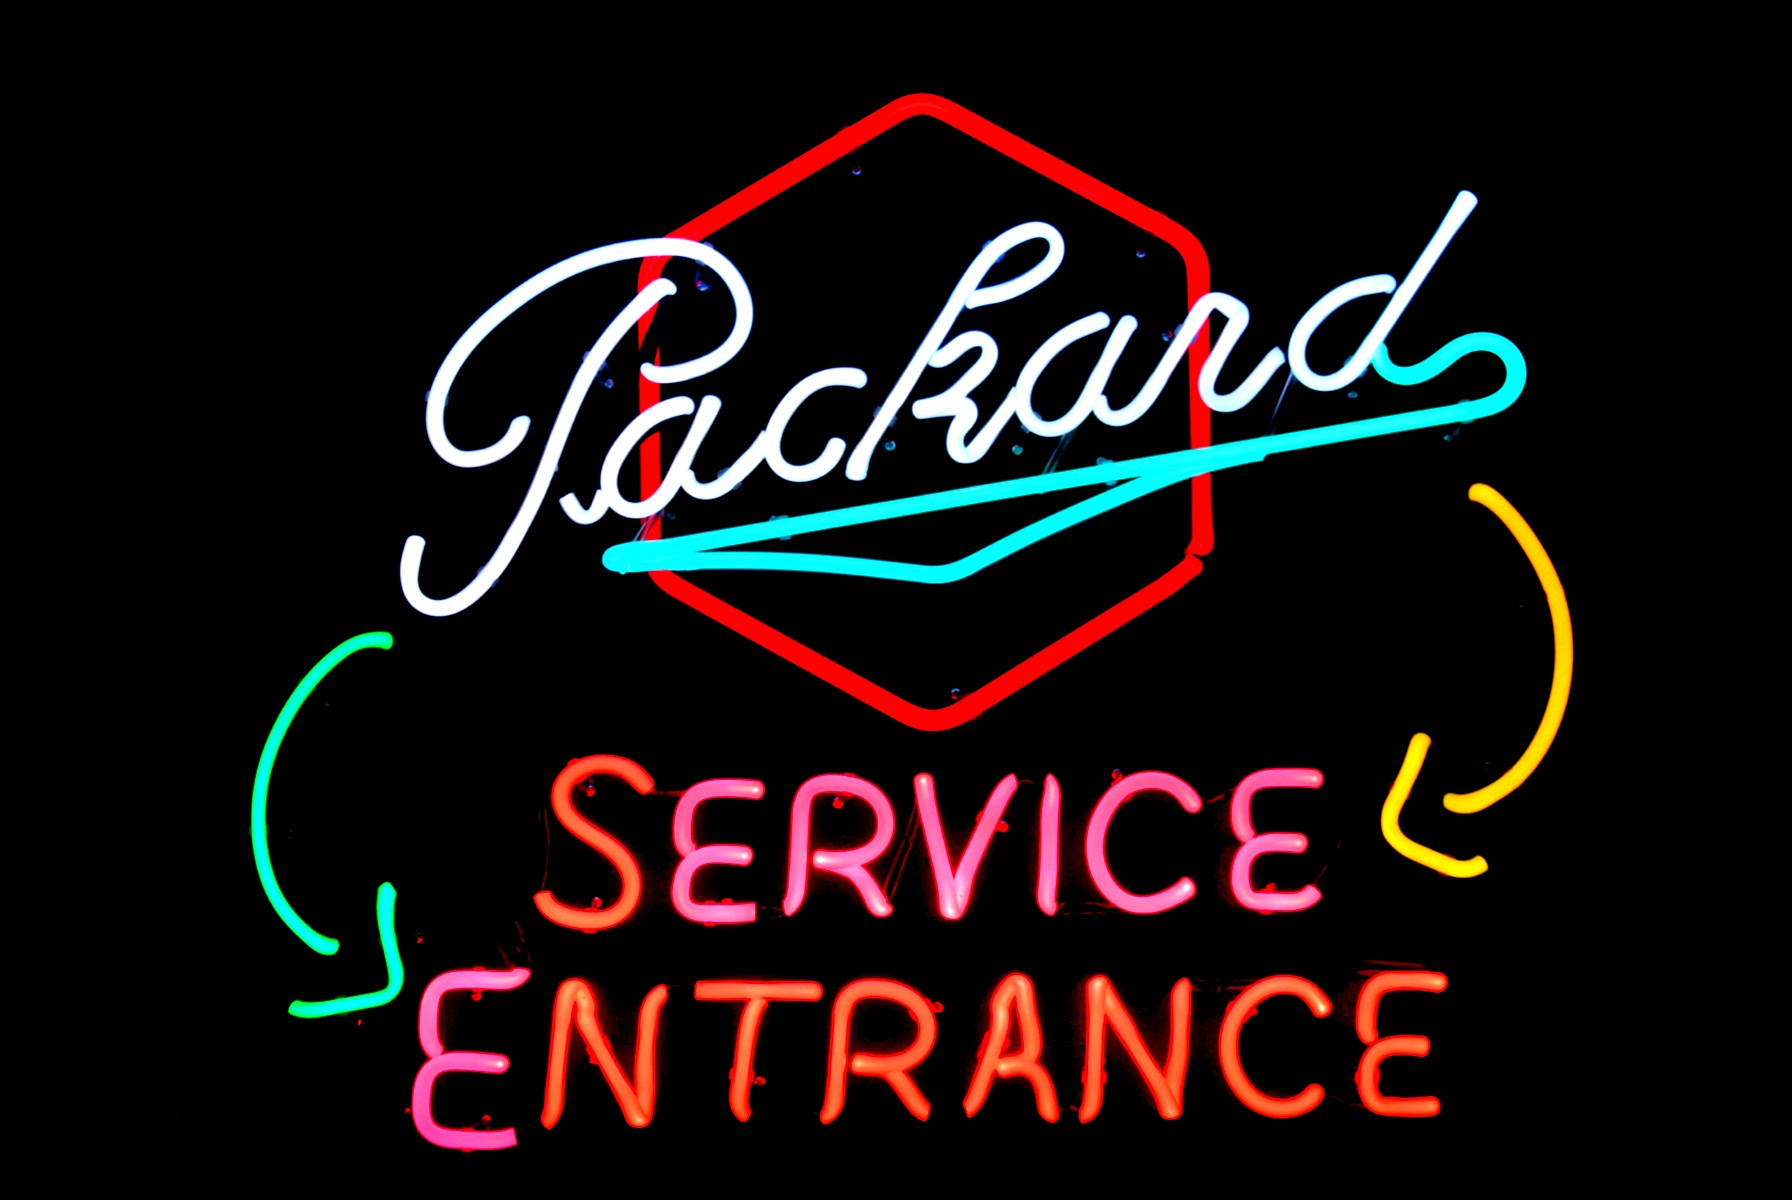 Packard Dealer Service Entrance animated neon sign - by former New Packard Car Dealer